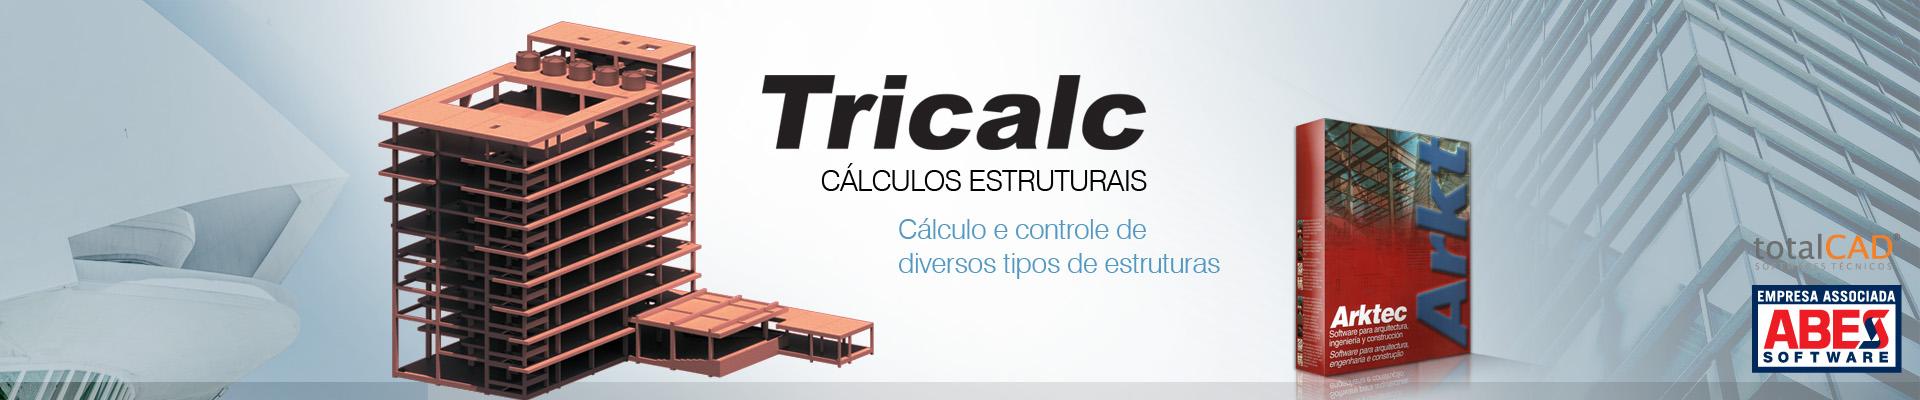 Tricalc